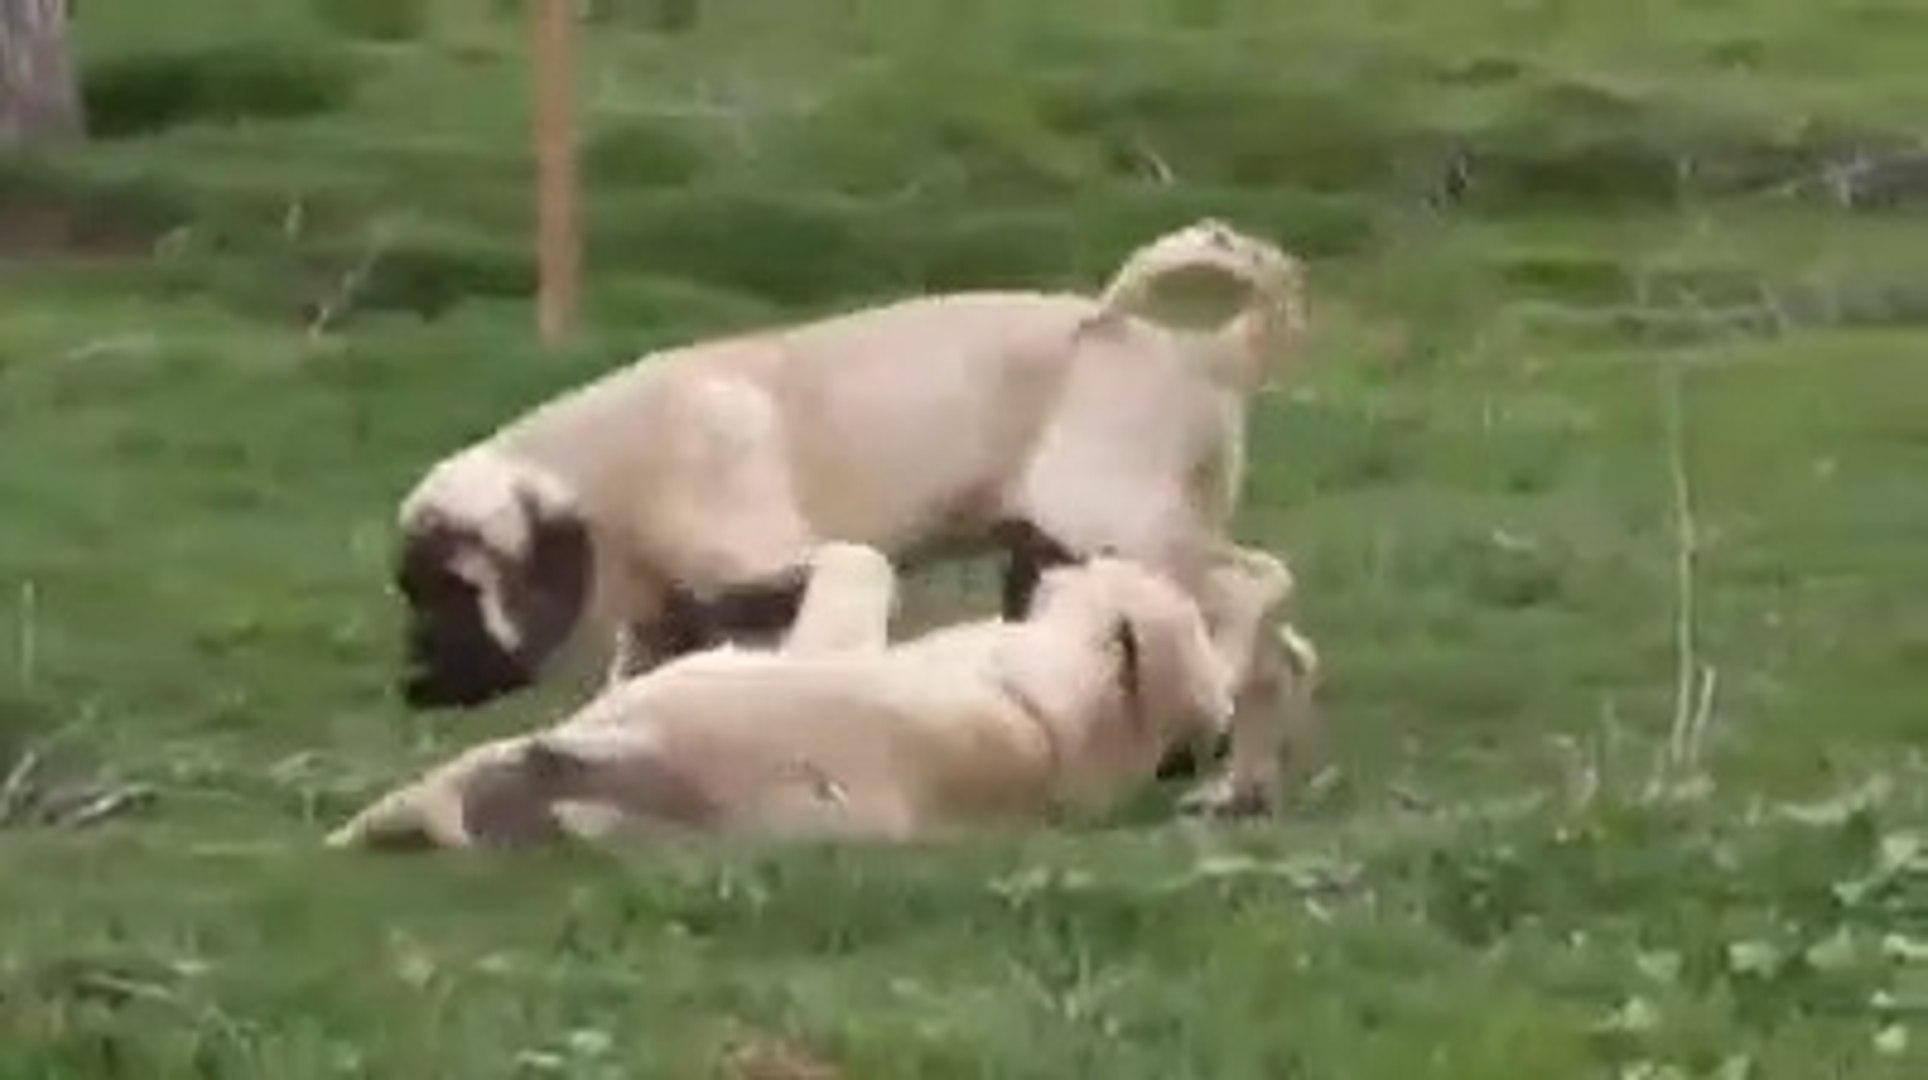 SEViMLi ANADOLU COBAN KOPEGi YAVRULARI - CUTE ANATOLiAN SHEPHERD DOG PUPPY